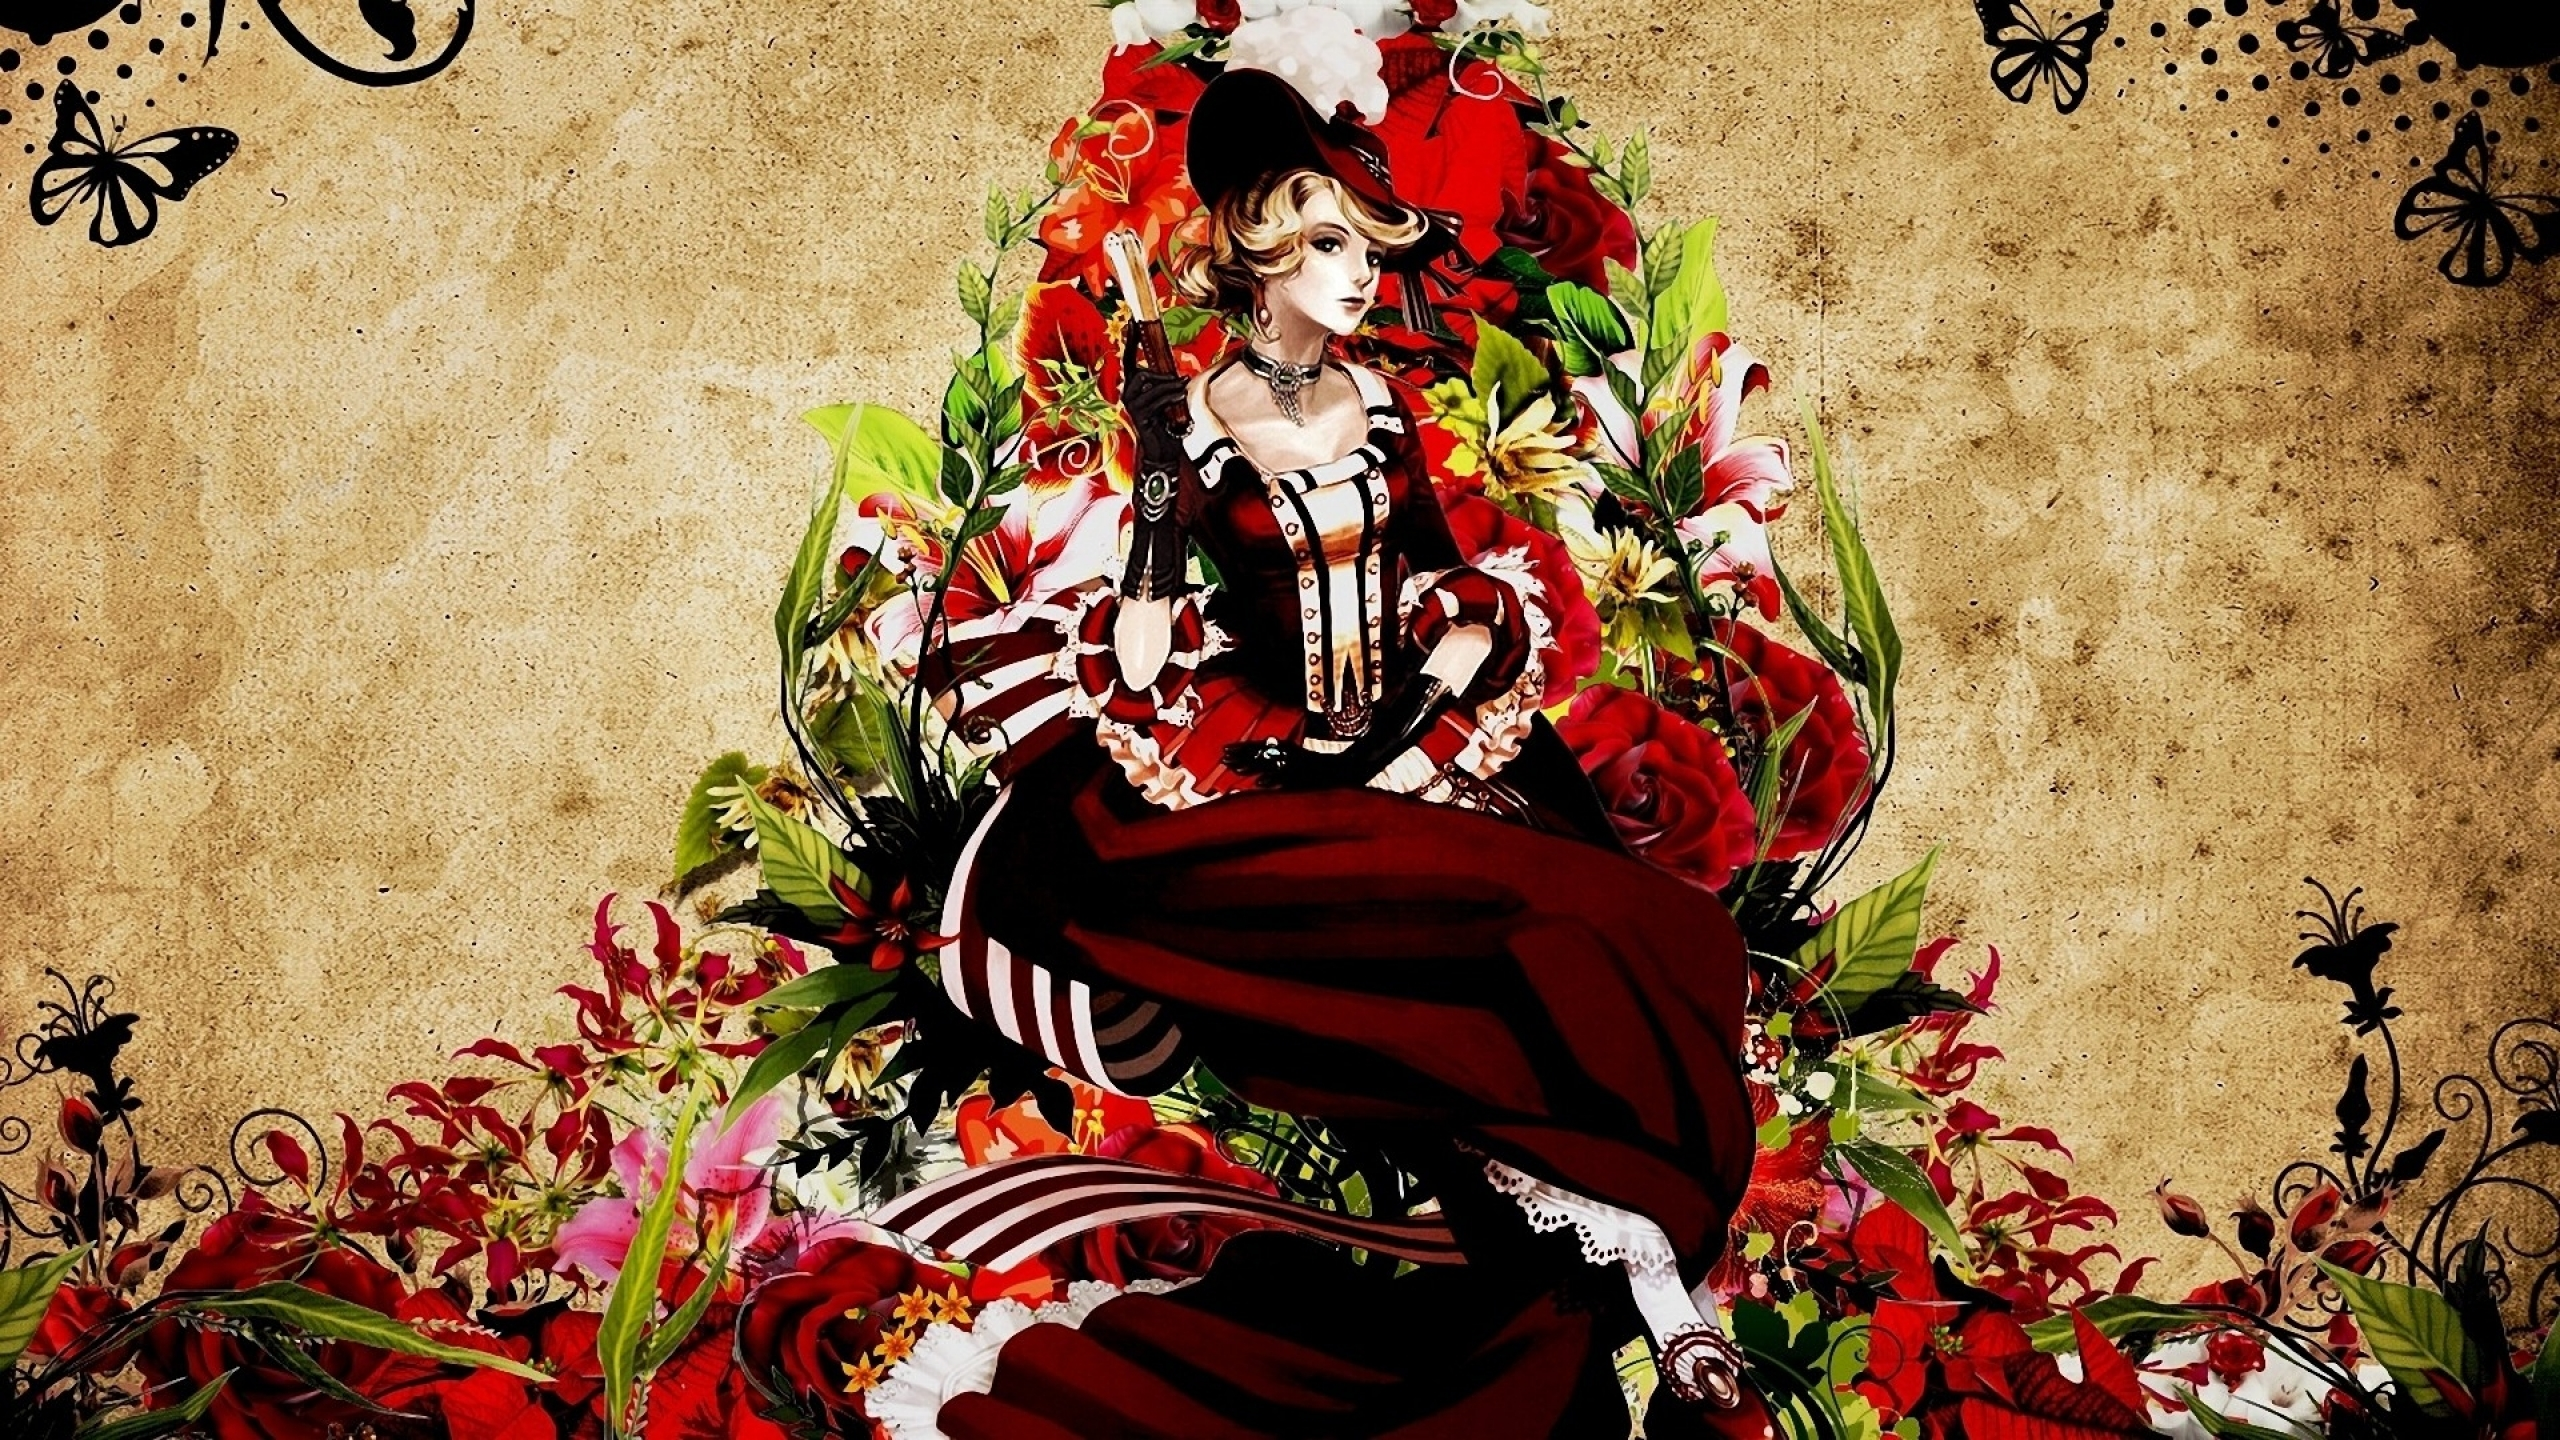 steampunk artwork anime hats anime girls 1920x1080 wallpaper Wallpaper 2560x1440